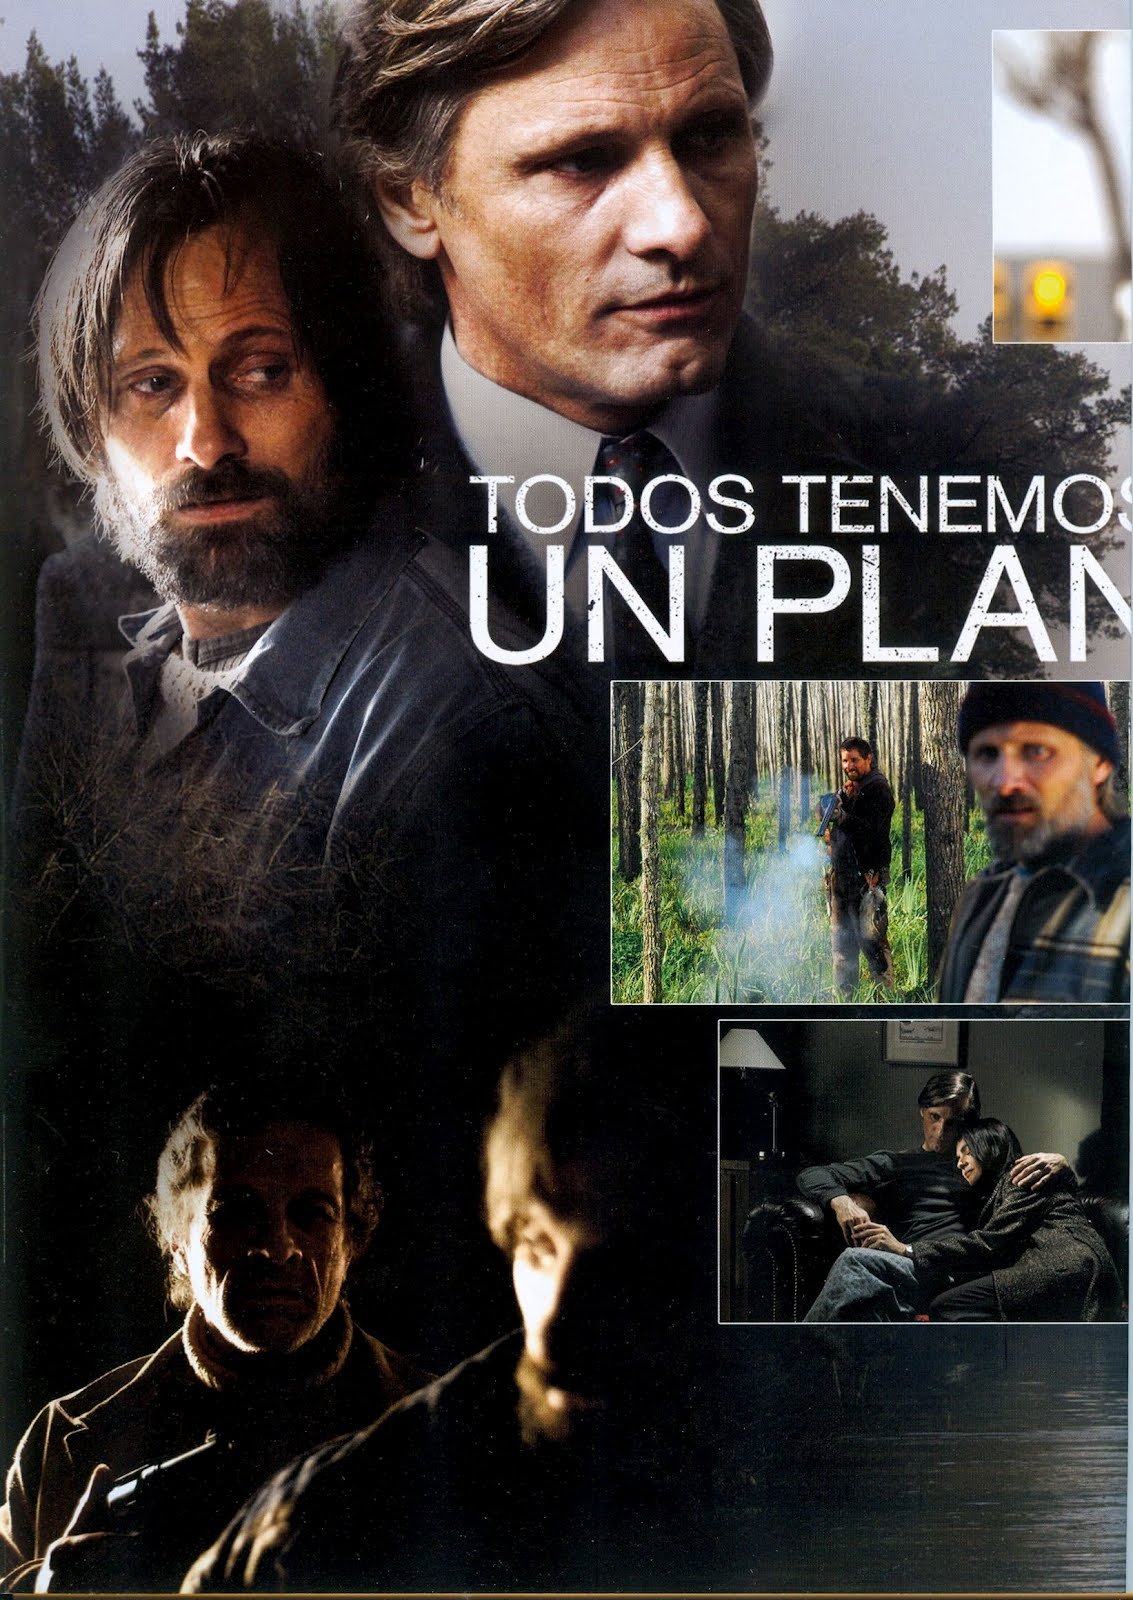 http://3.bp.blogspot.com/-m-C1JYYxL9c/URQF4jmKEdI/AAAAAAAAAlI/xPt_wwHpaKg/s1600/Todos_Tenemos_Un_Plan_guia_01.jpg